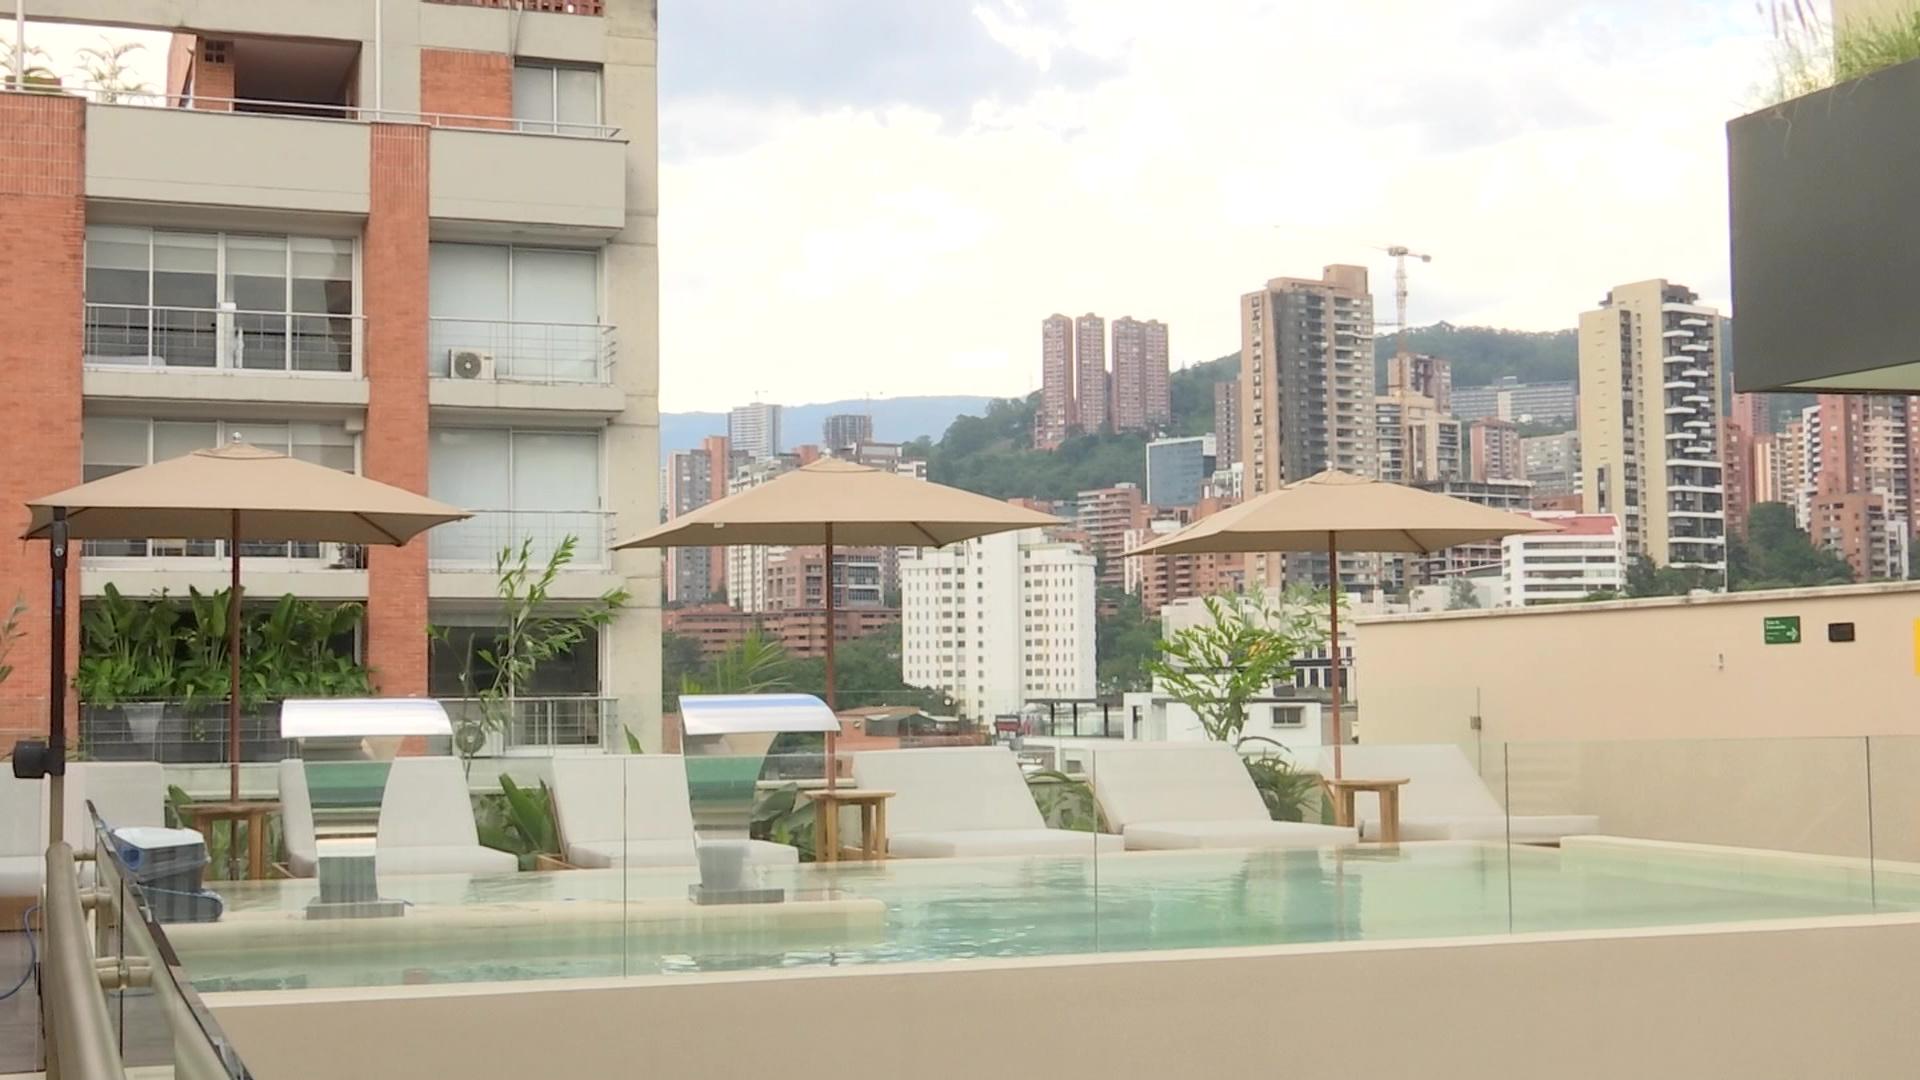 Hoteles lujosos, la nueva tendencia en hospedaje